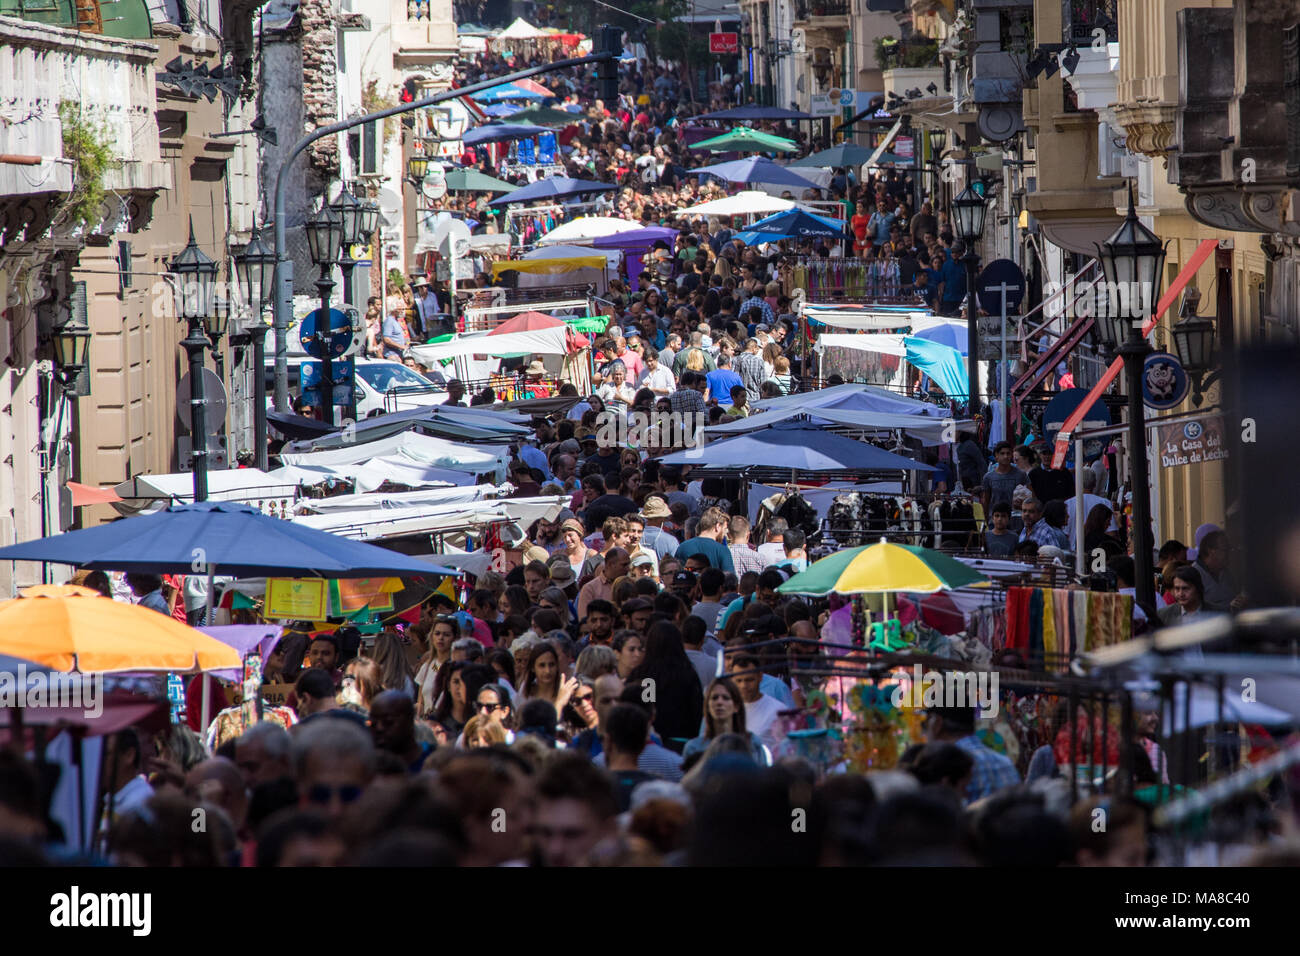 Feria de San Telmo, Sunday Market, Buenos Aires, Argentina - Stock Image